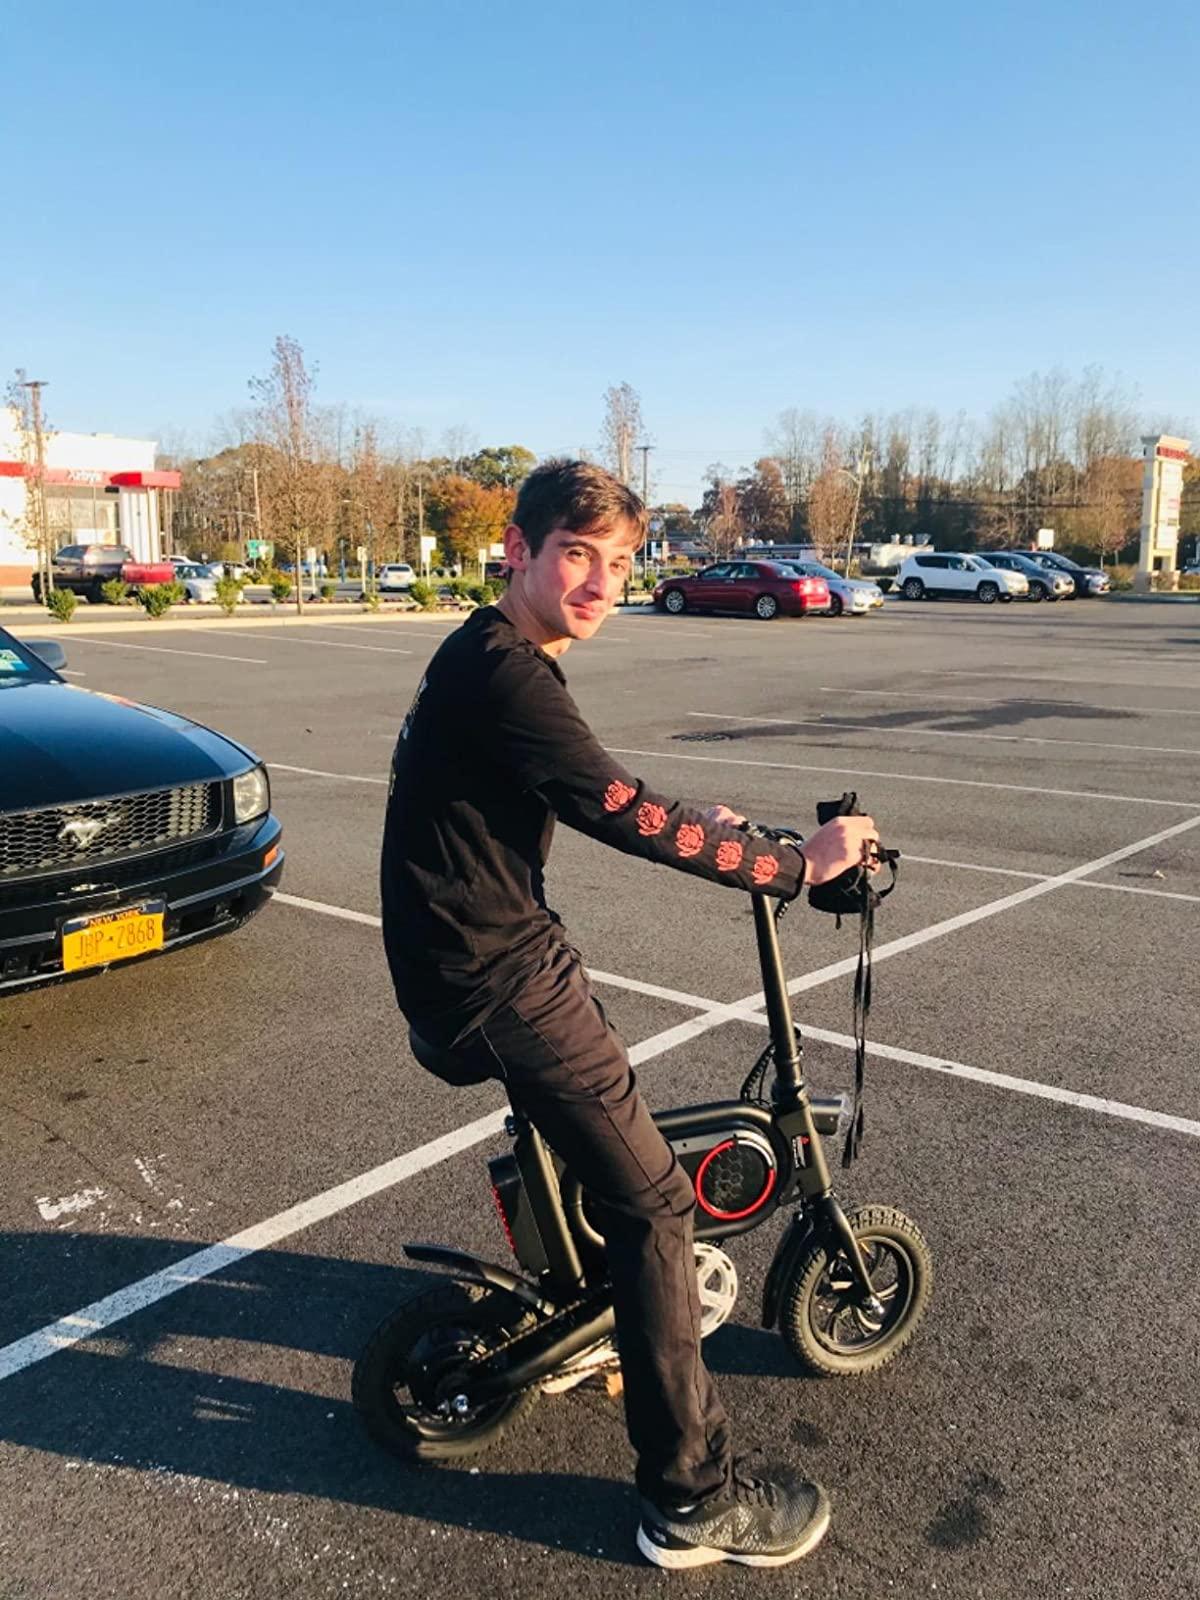 Hiboy P10 fast and durable e-bike